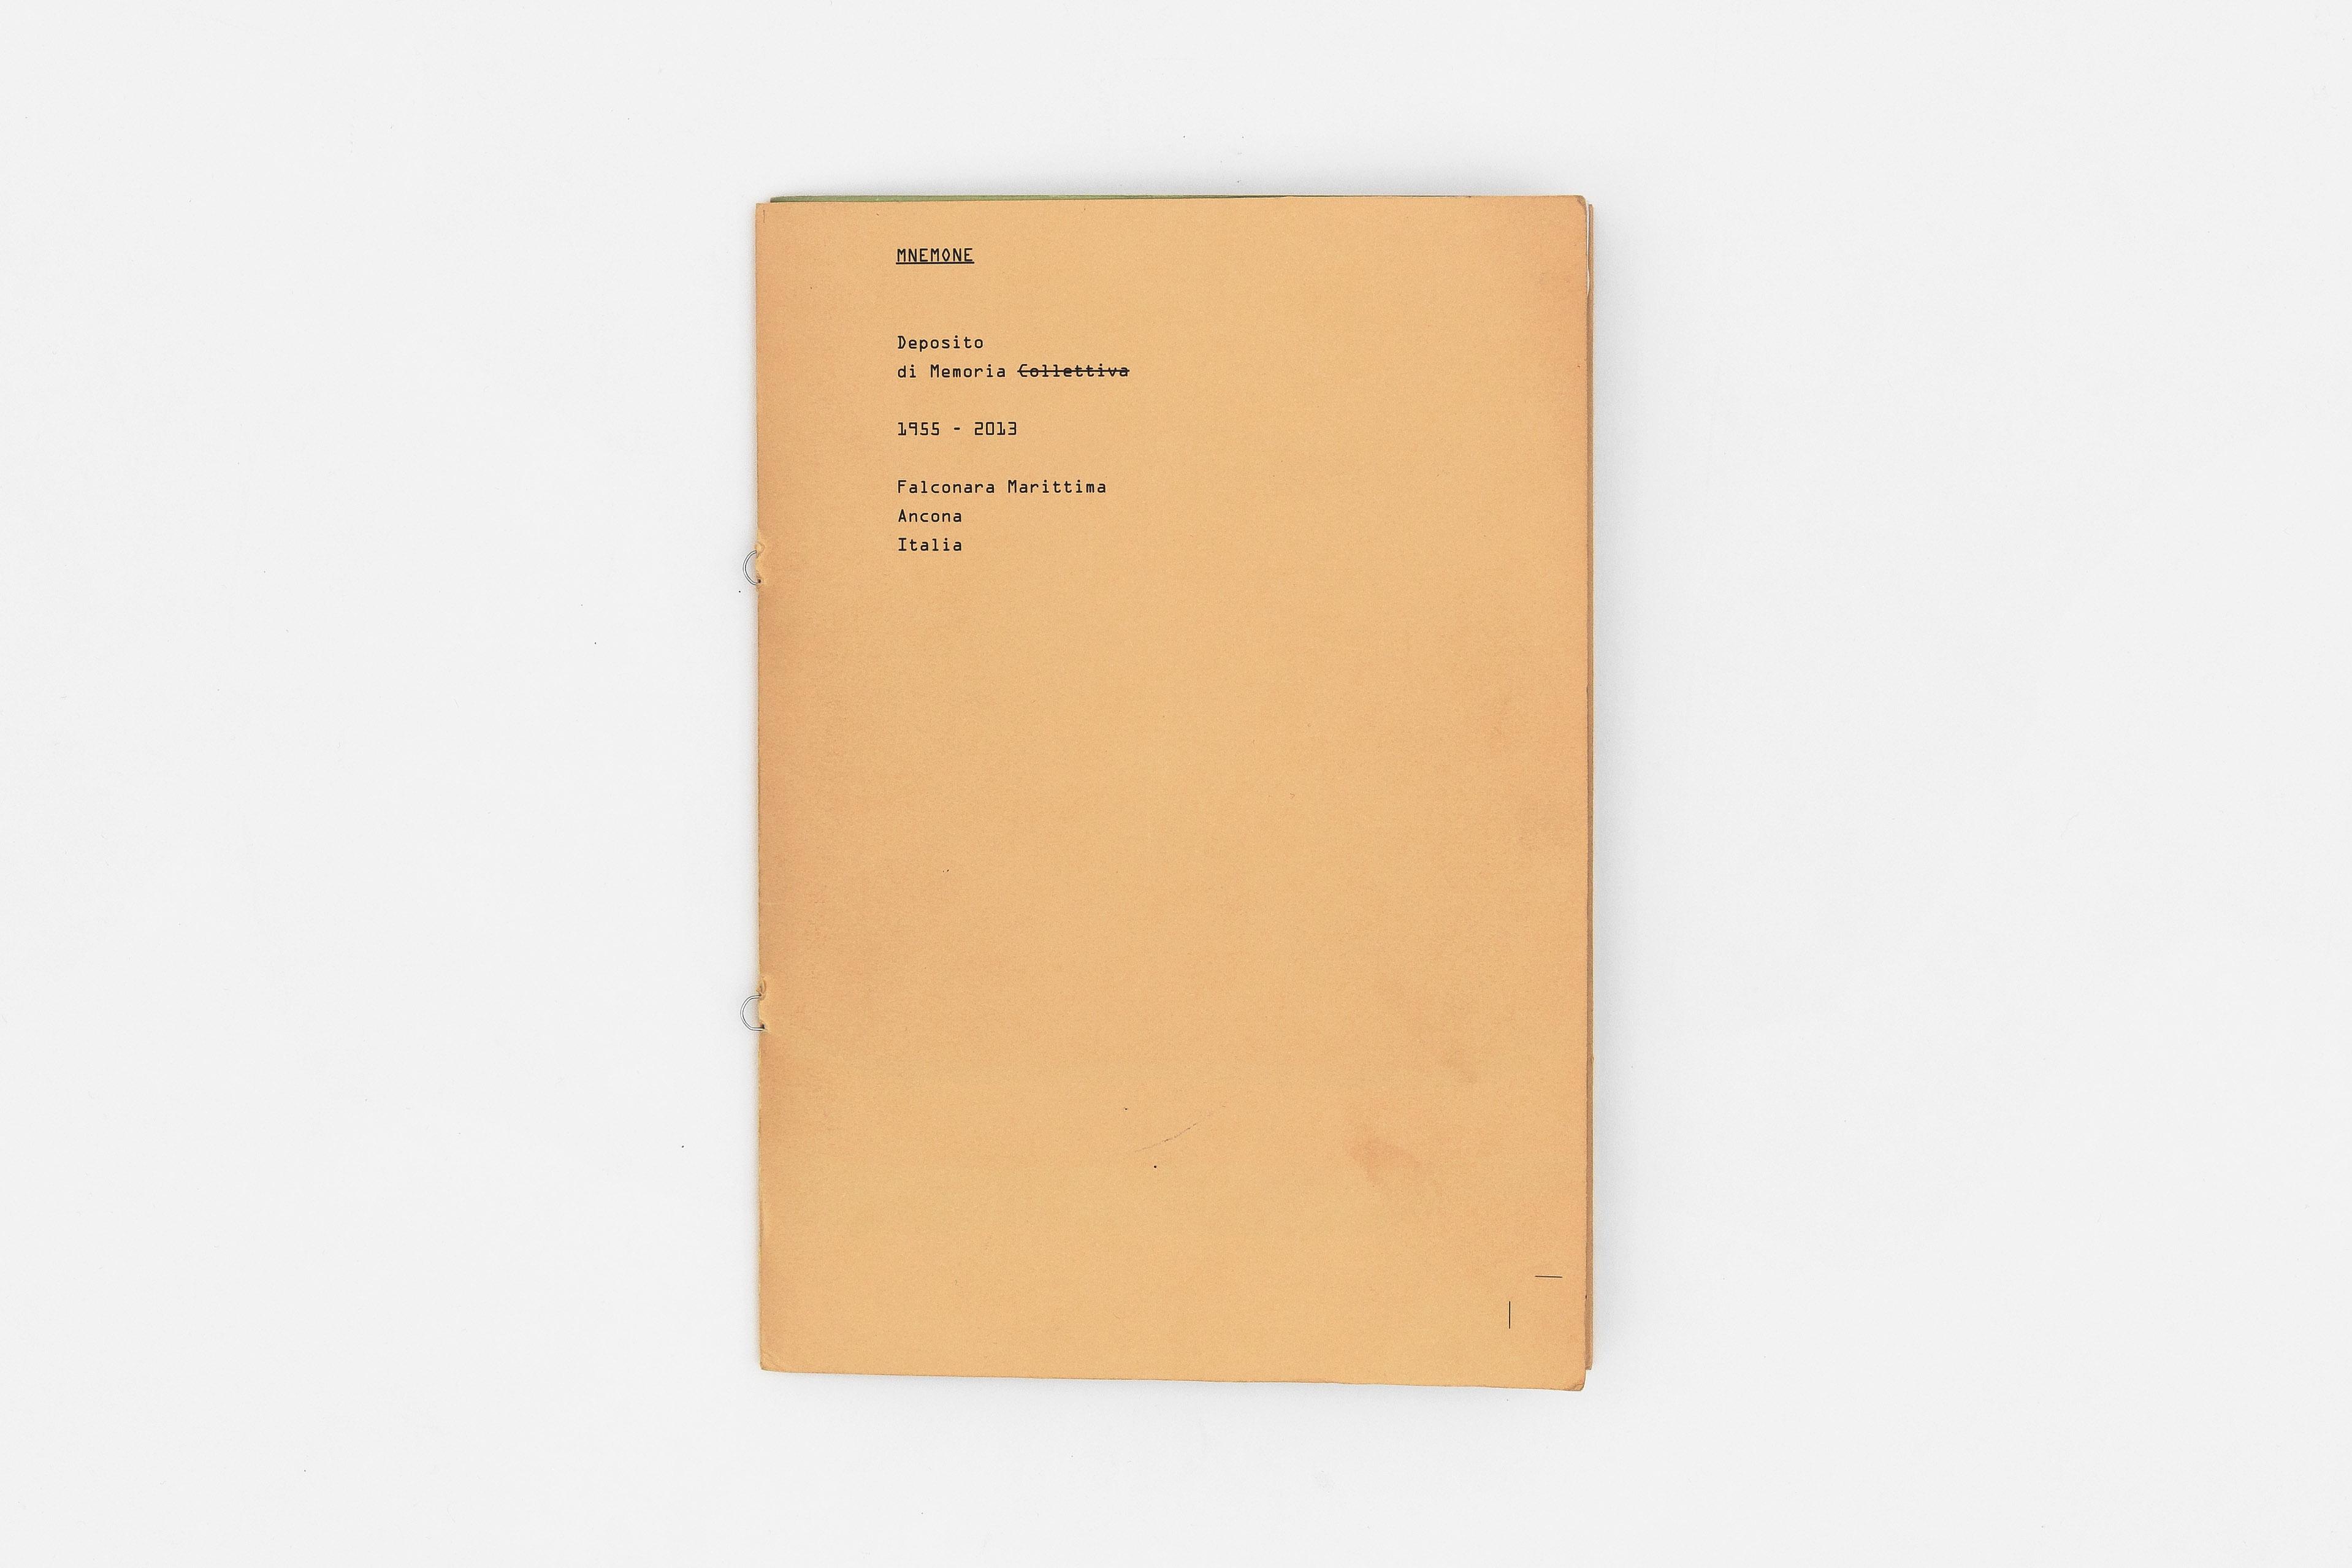 Nicola Leck - Mnemone / Esame Triennio ISIA